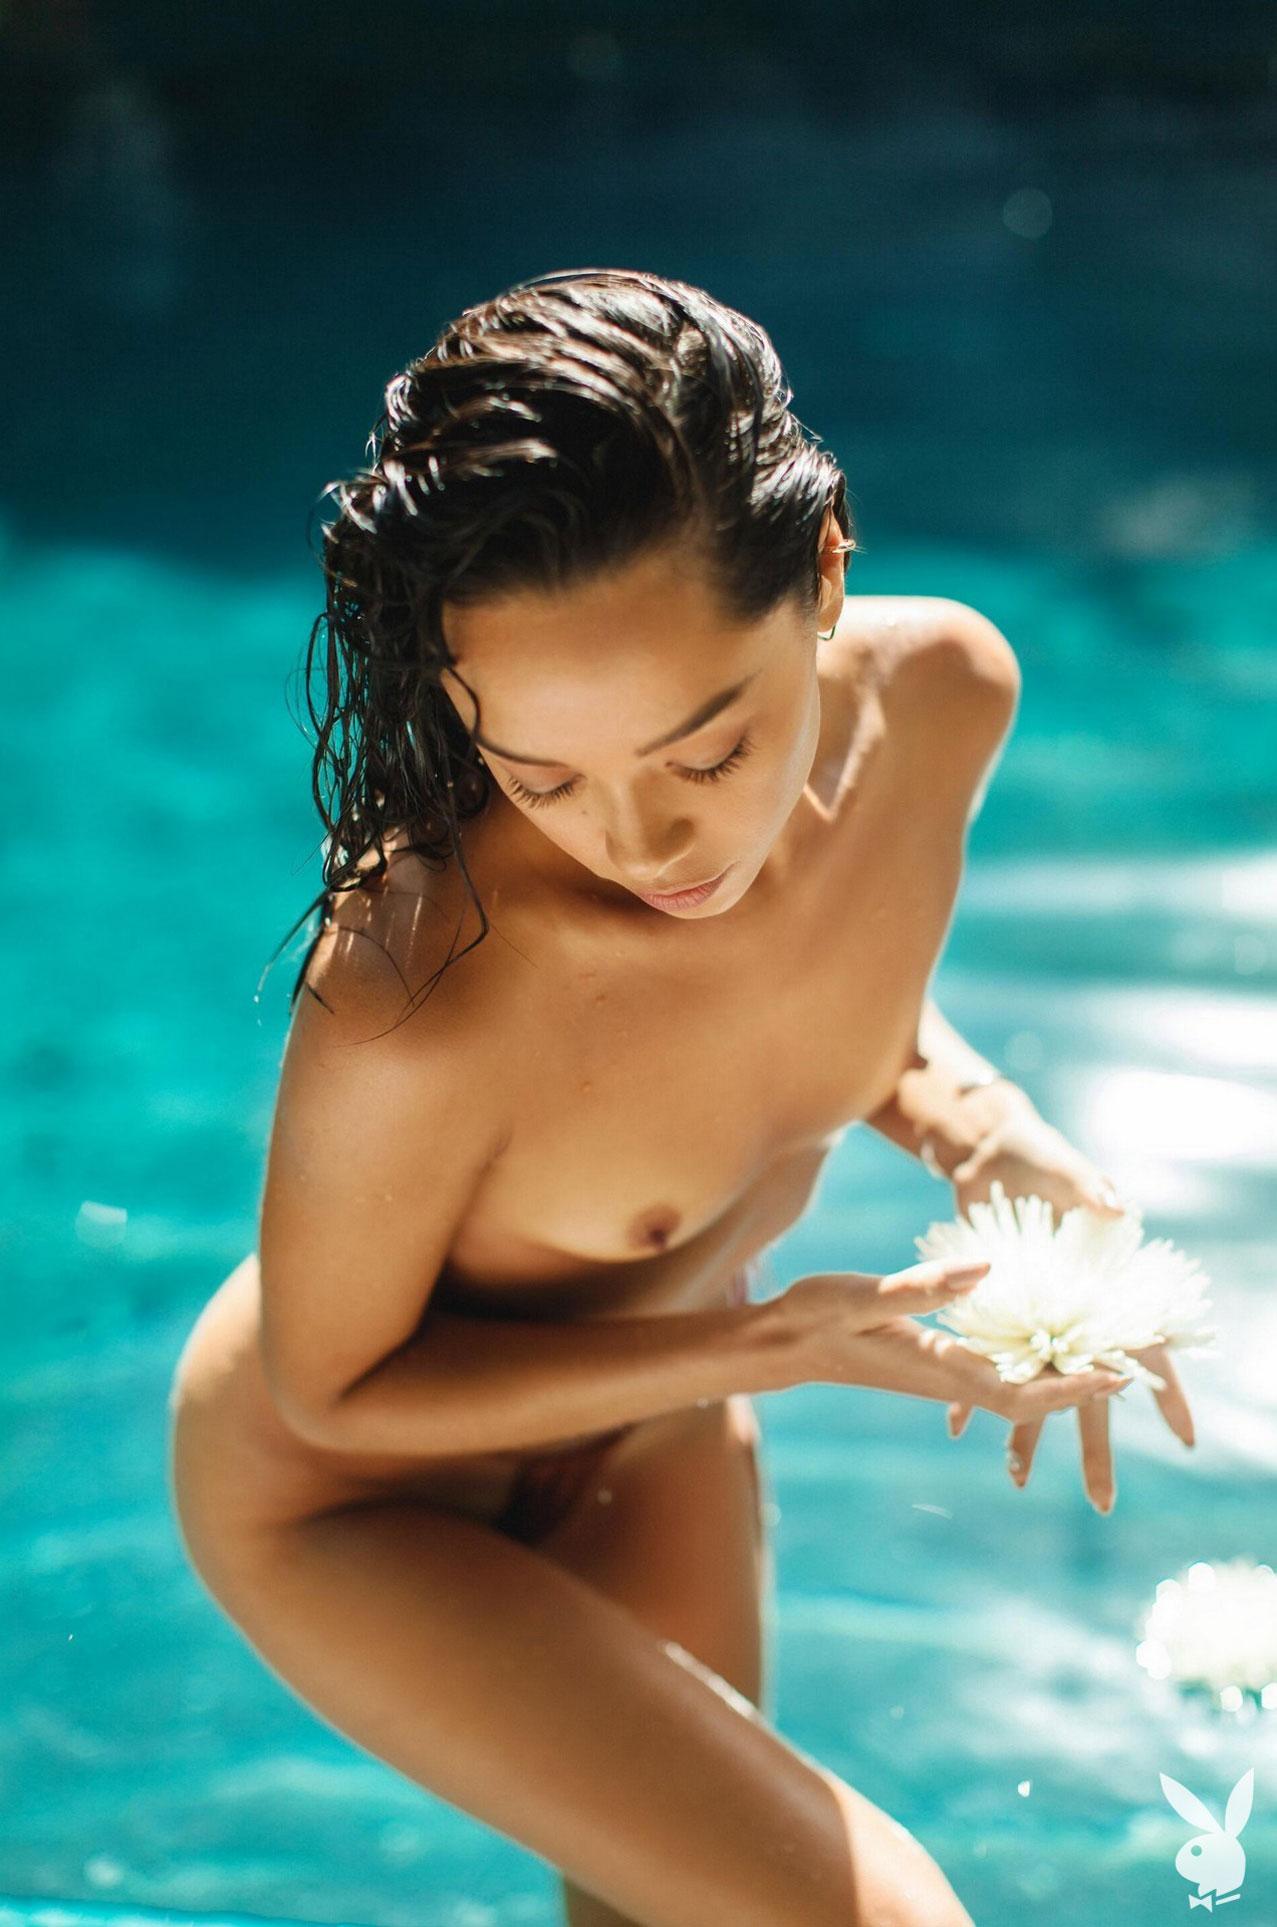 Девушка месяца Даниэлла Алькараз, Playboy США сентябрь 2020 / фото 17